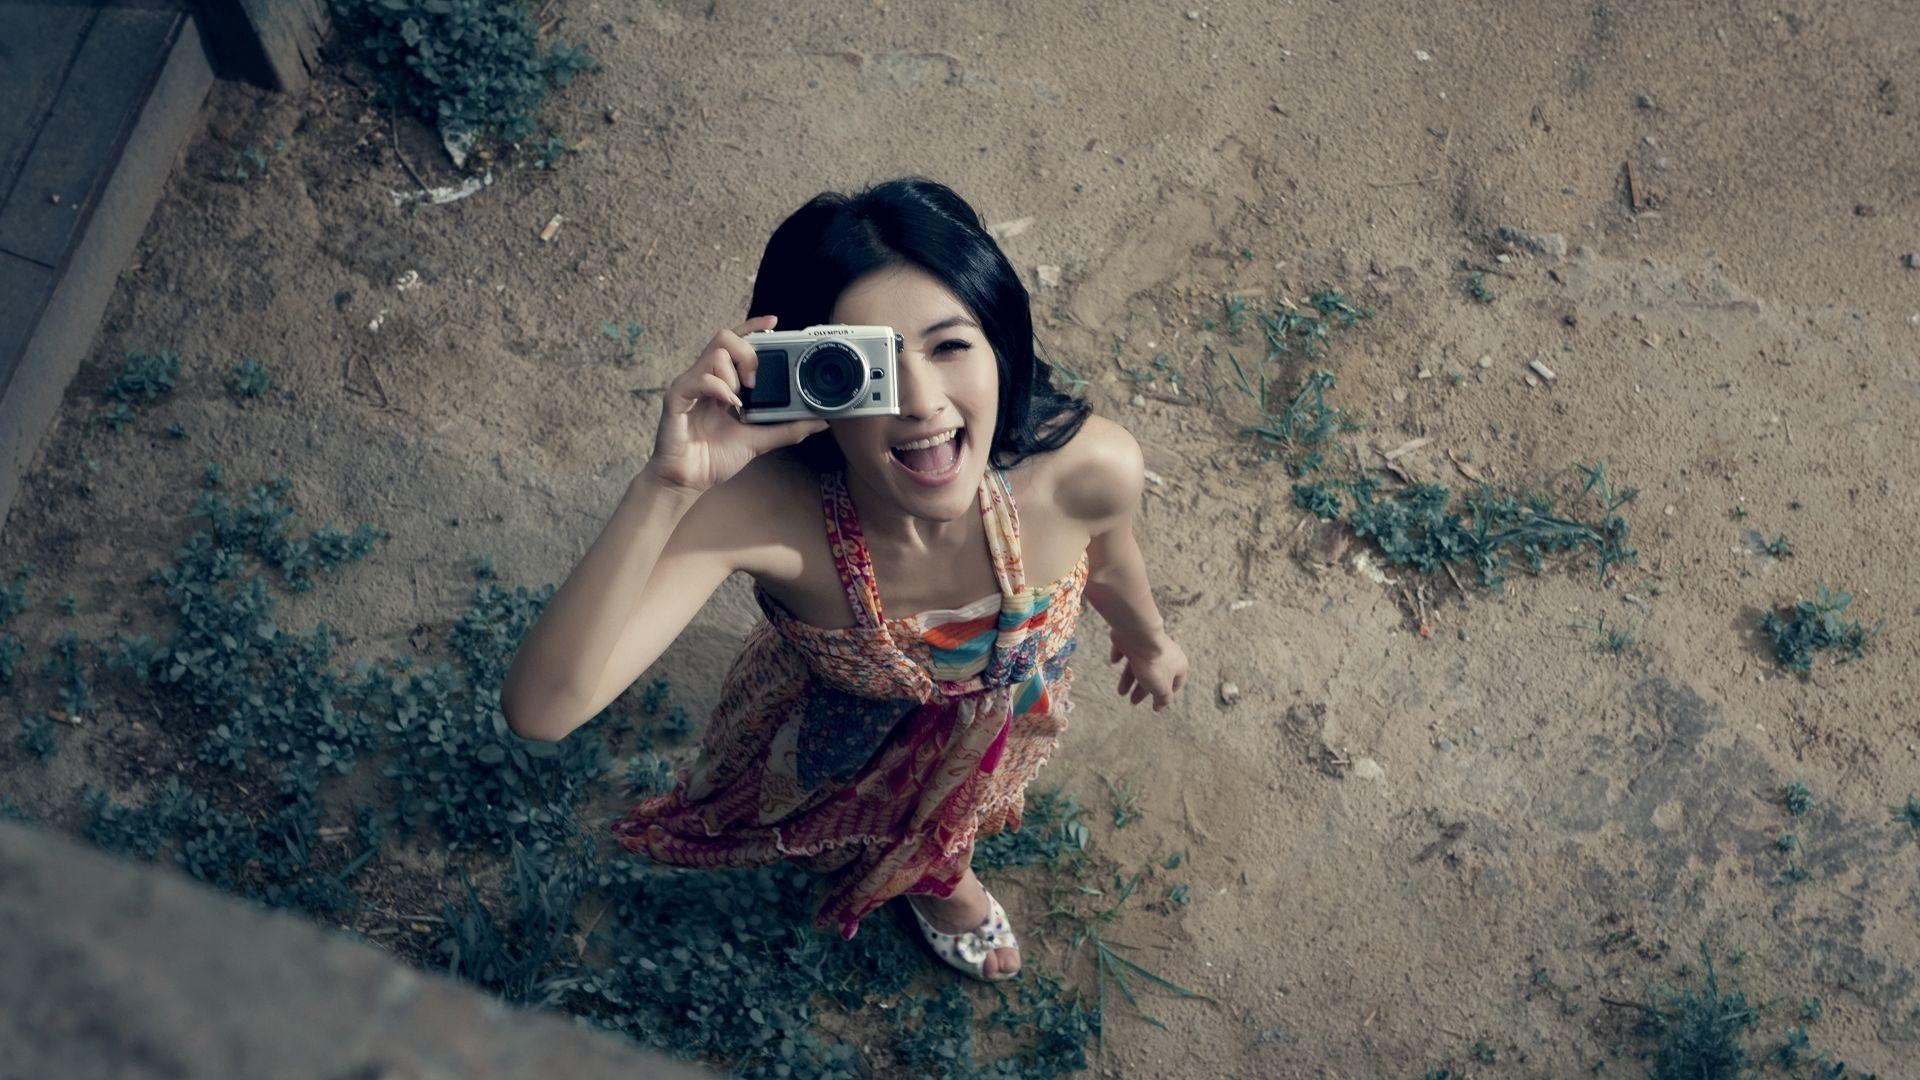 16 Luxury Pubg Wallpaper Iphone 6: 壁纸 快乐女孩使用相机 1920x1080 Full HD 2K 高清壁纸, 图片, 照片